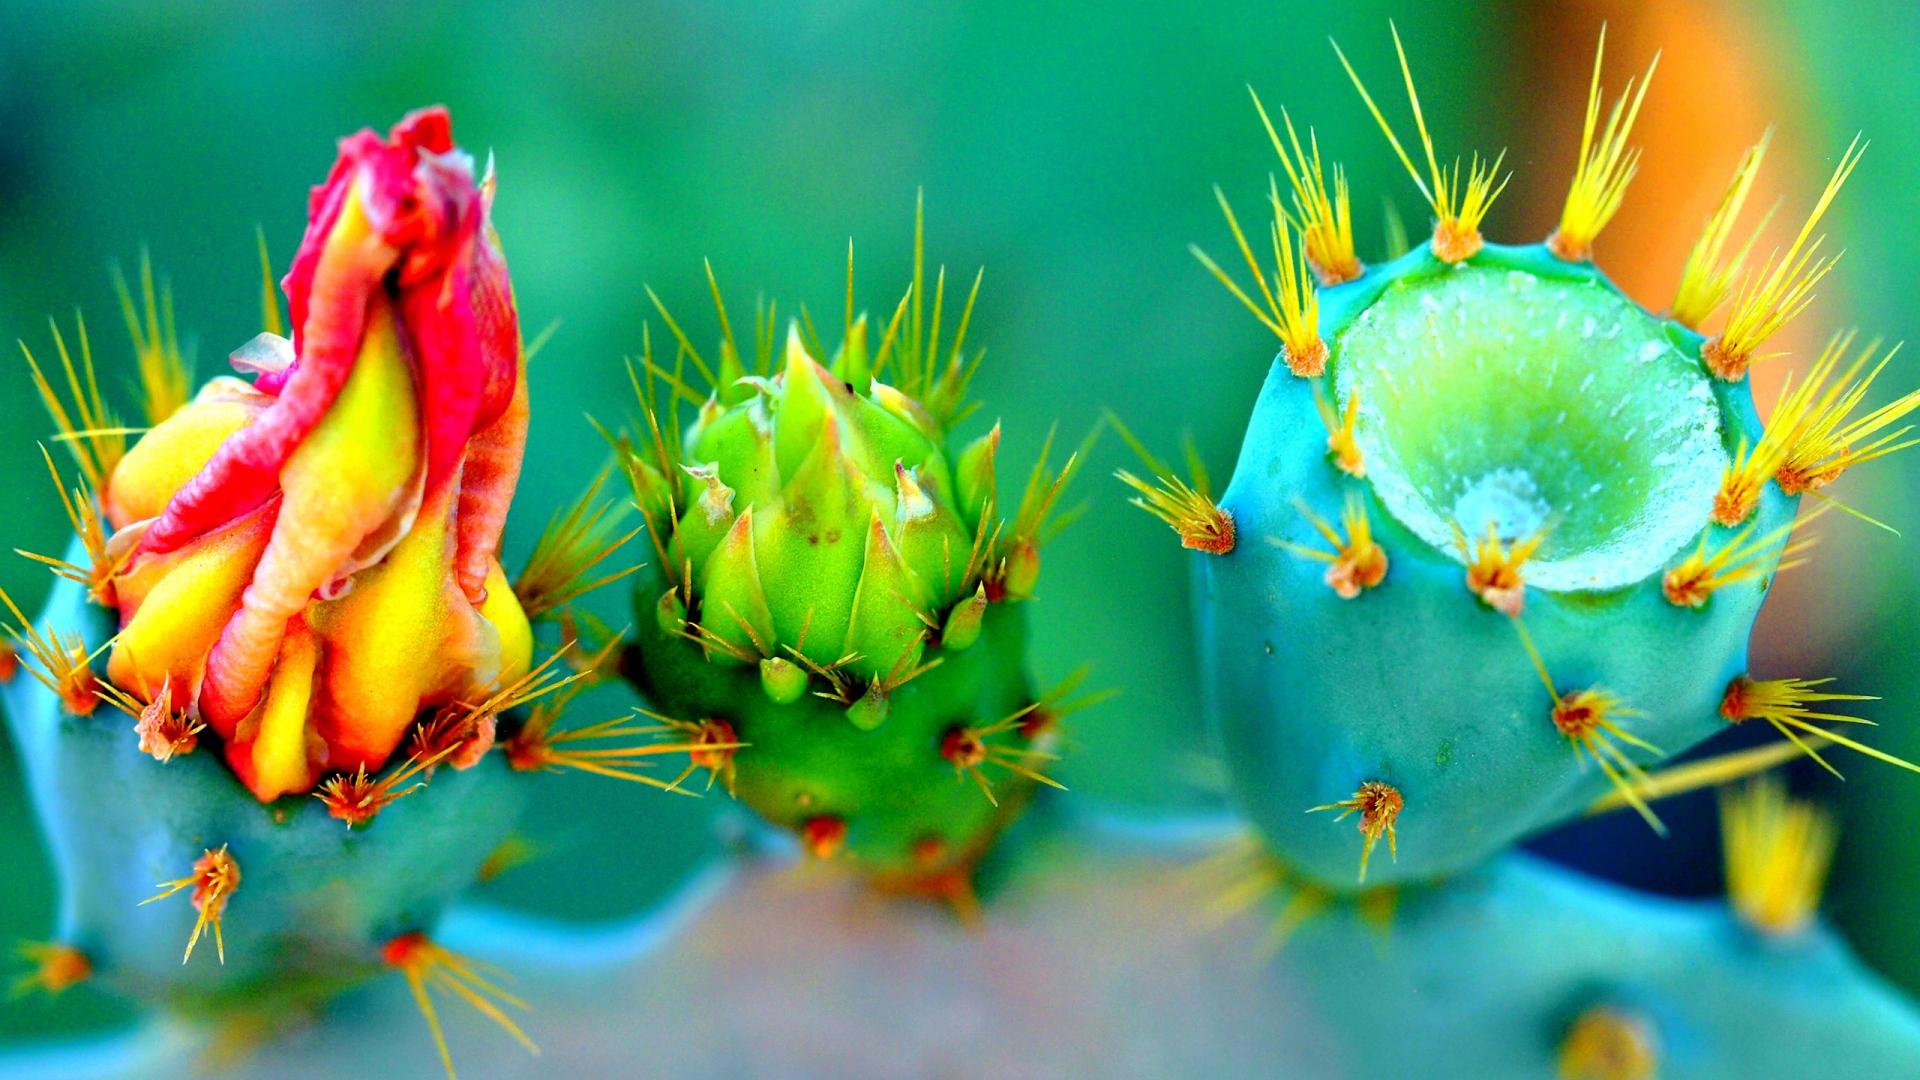 Pixel Forest Wallpaper Cute Cactus Desktop Background Pixelstalk Net